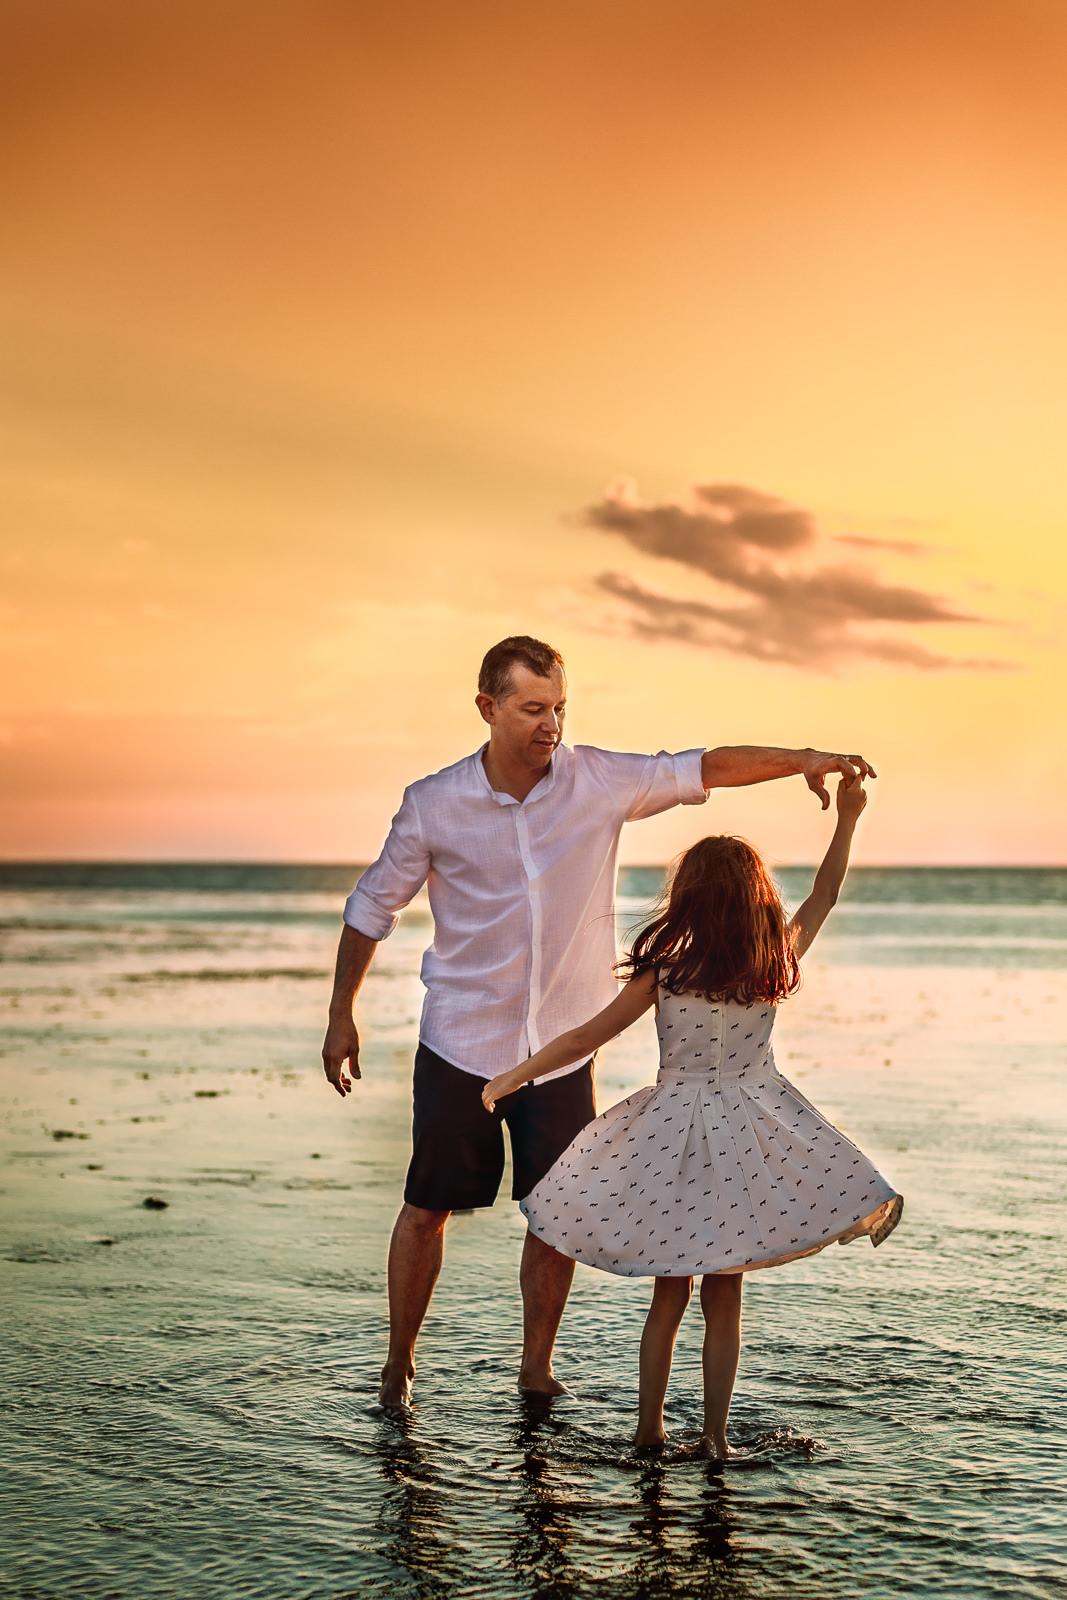 Cape Cod Beach Family Photo Session -20